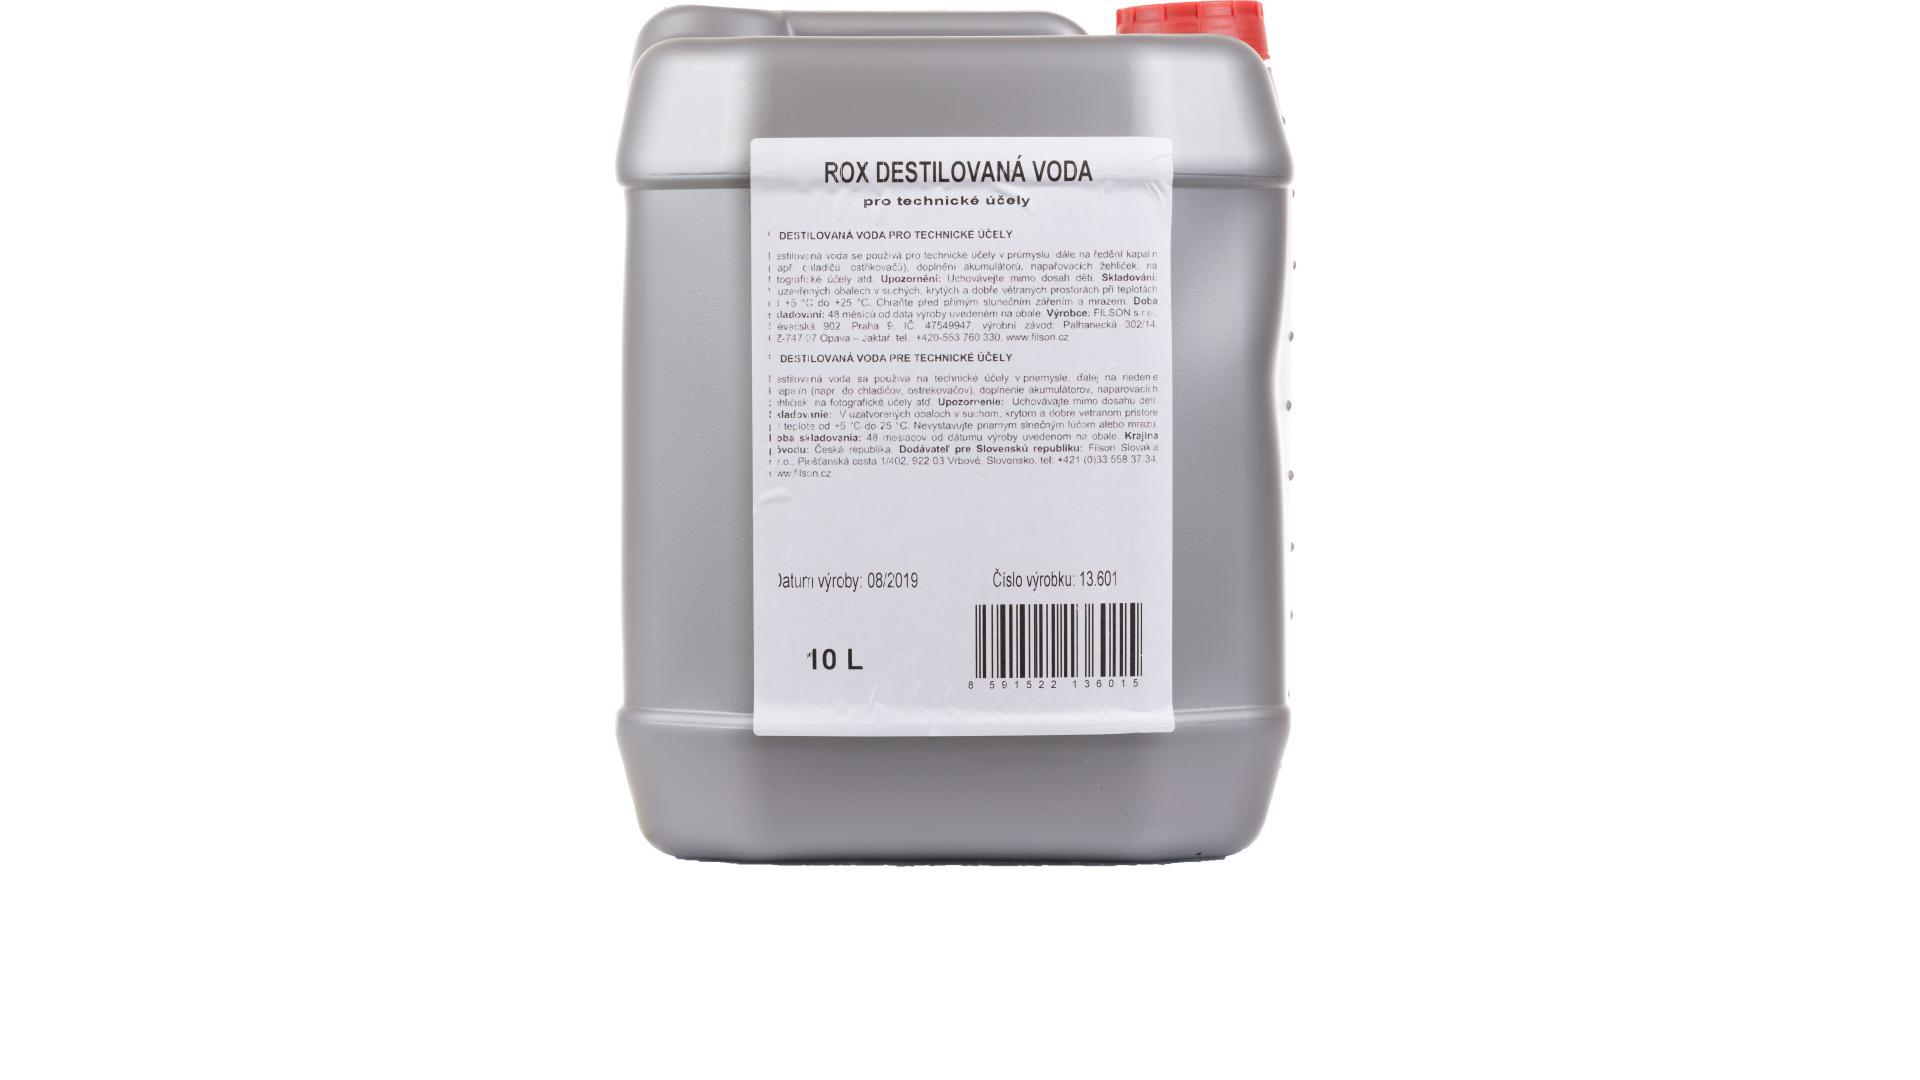 ROX destilovaná voda - 10l